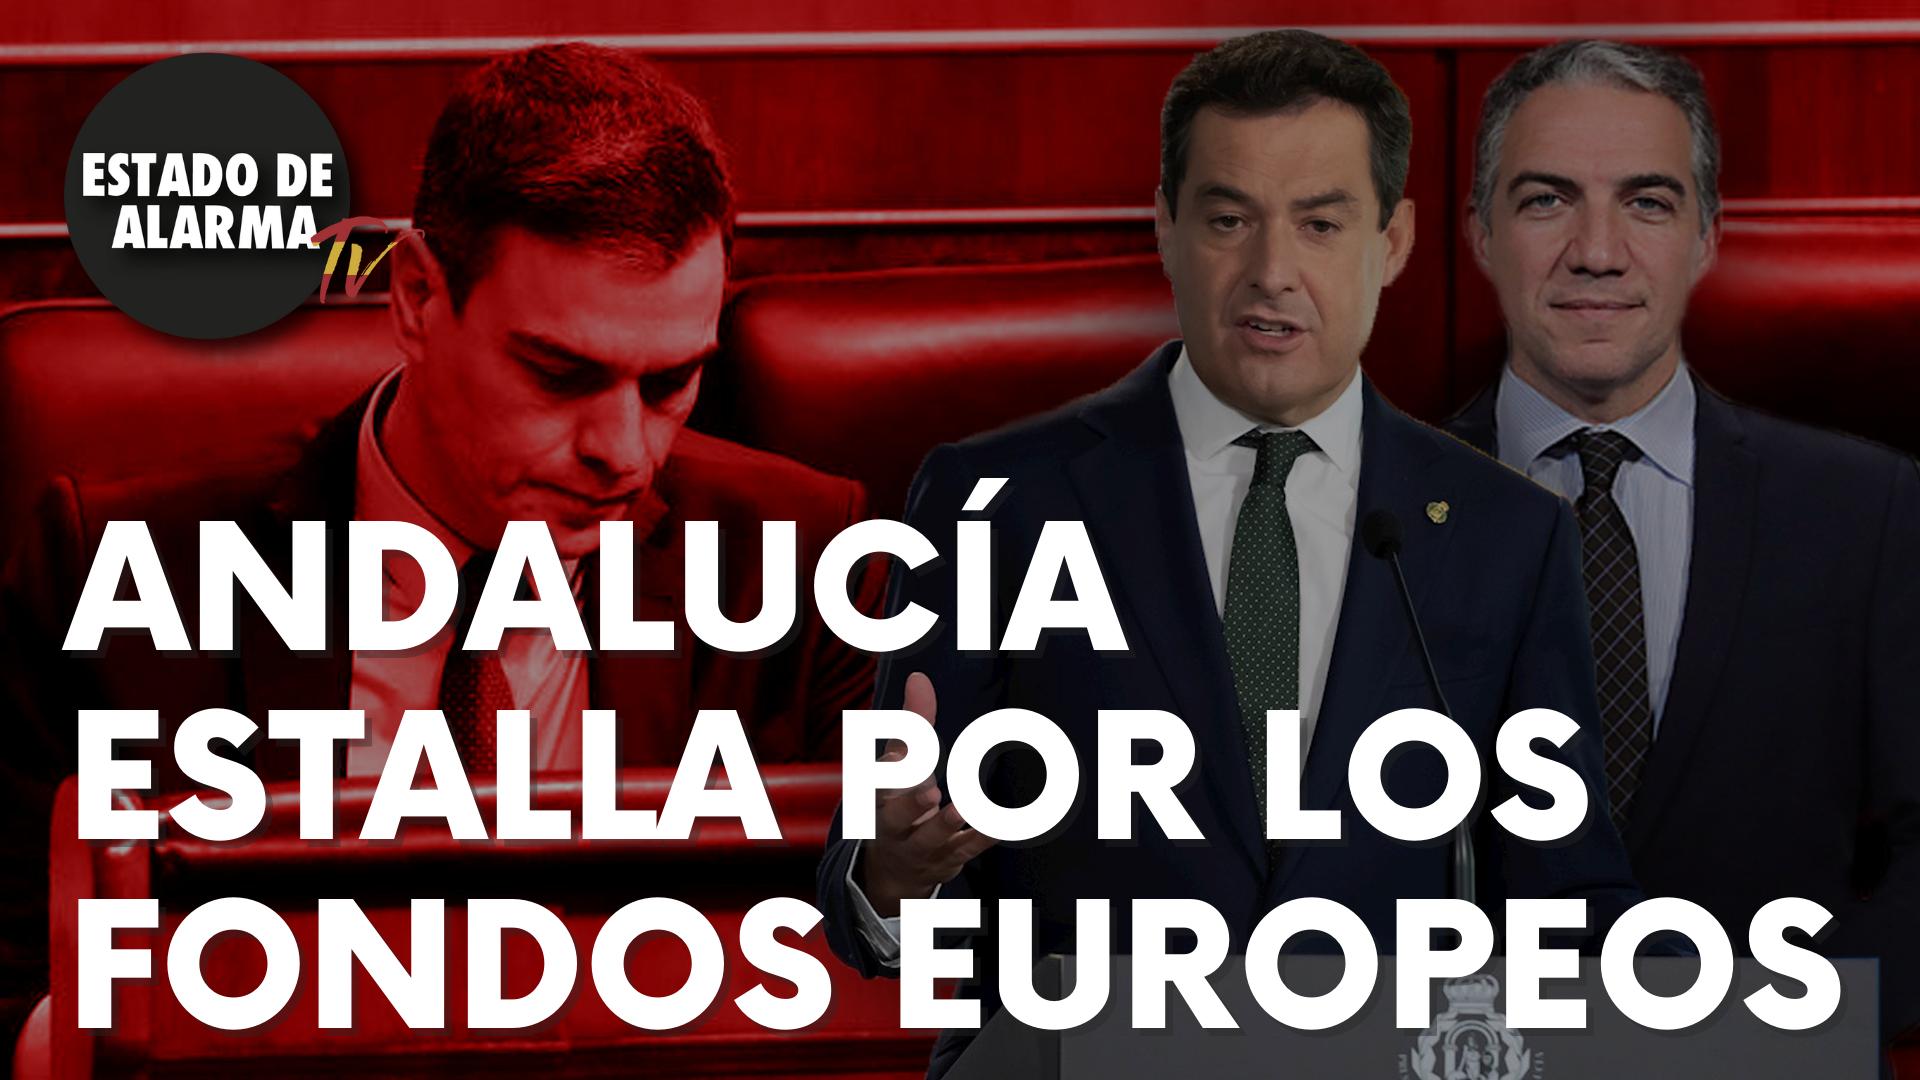 Andalucía estalla por los fondos europeos